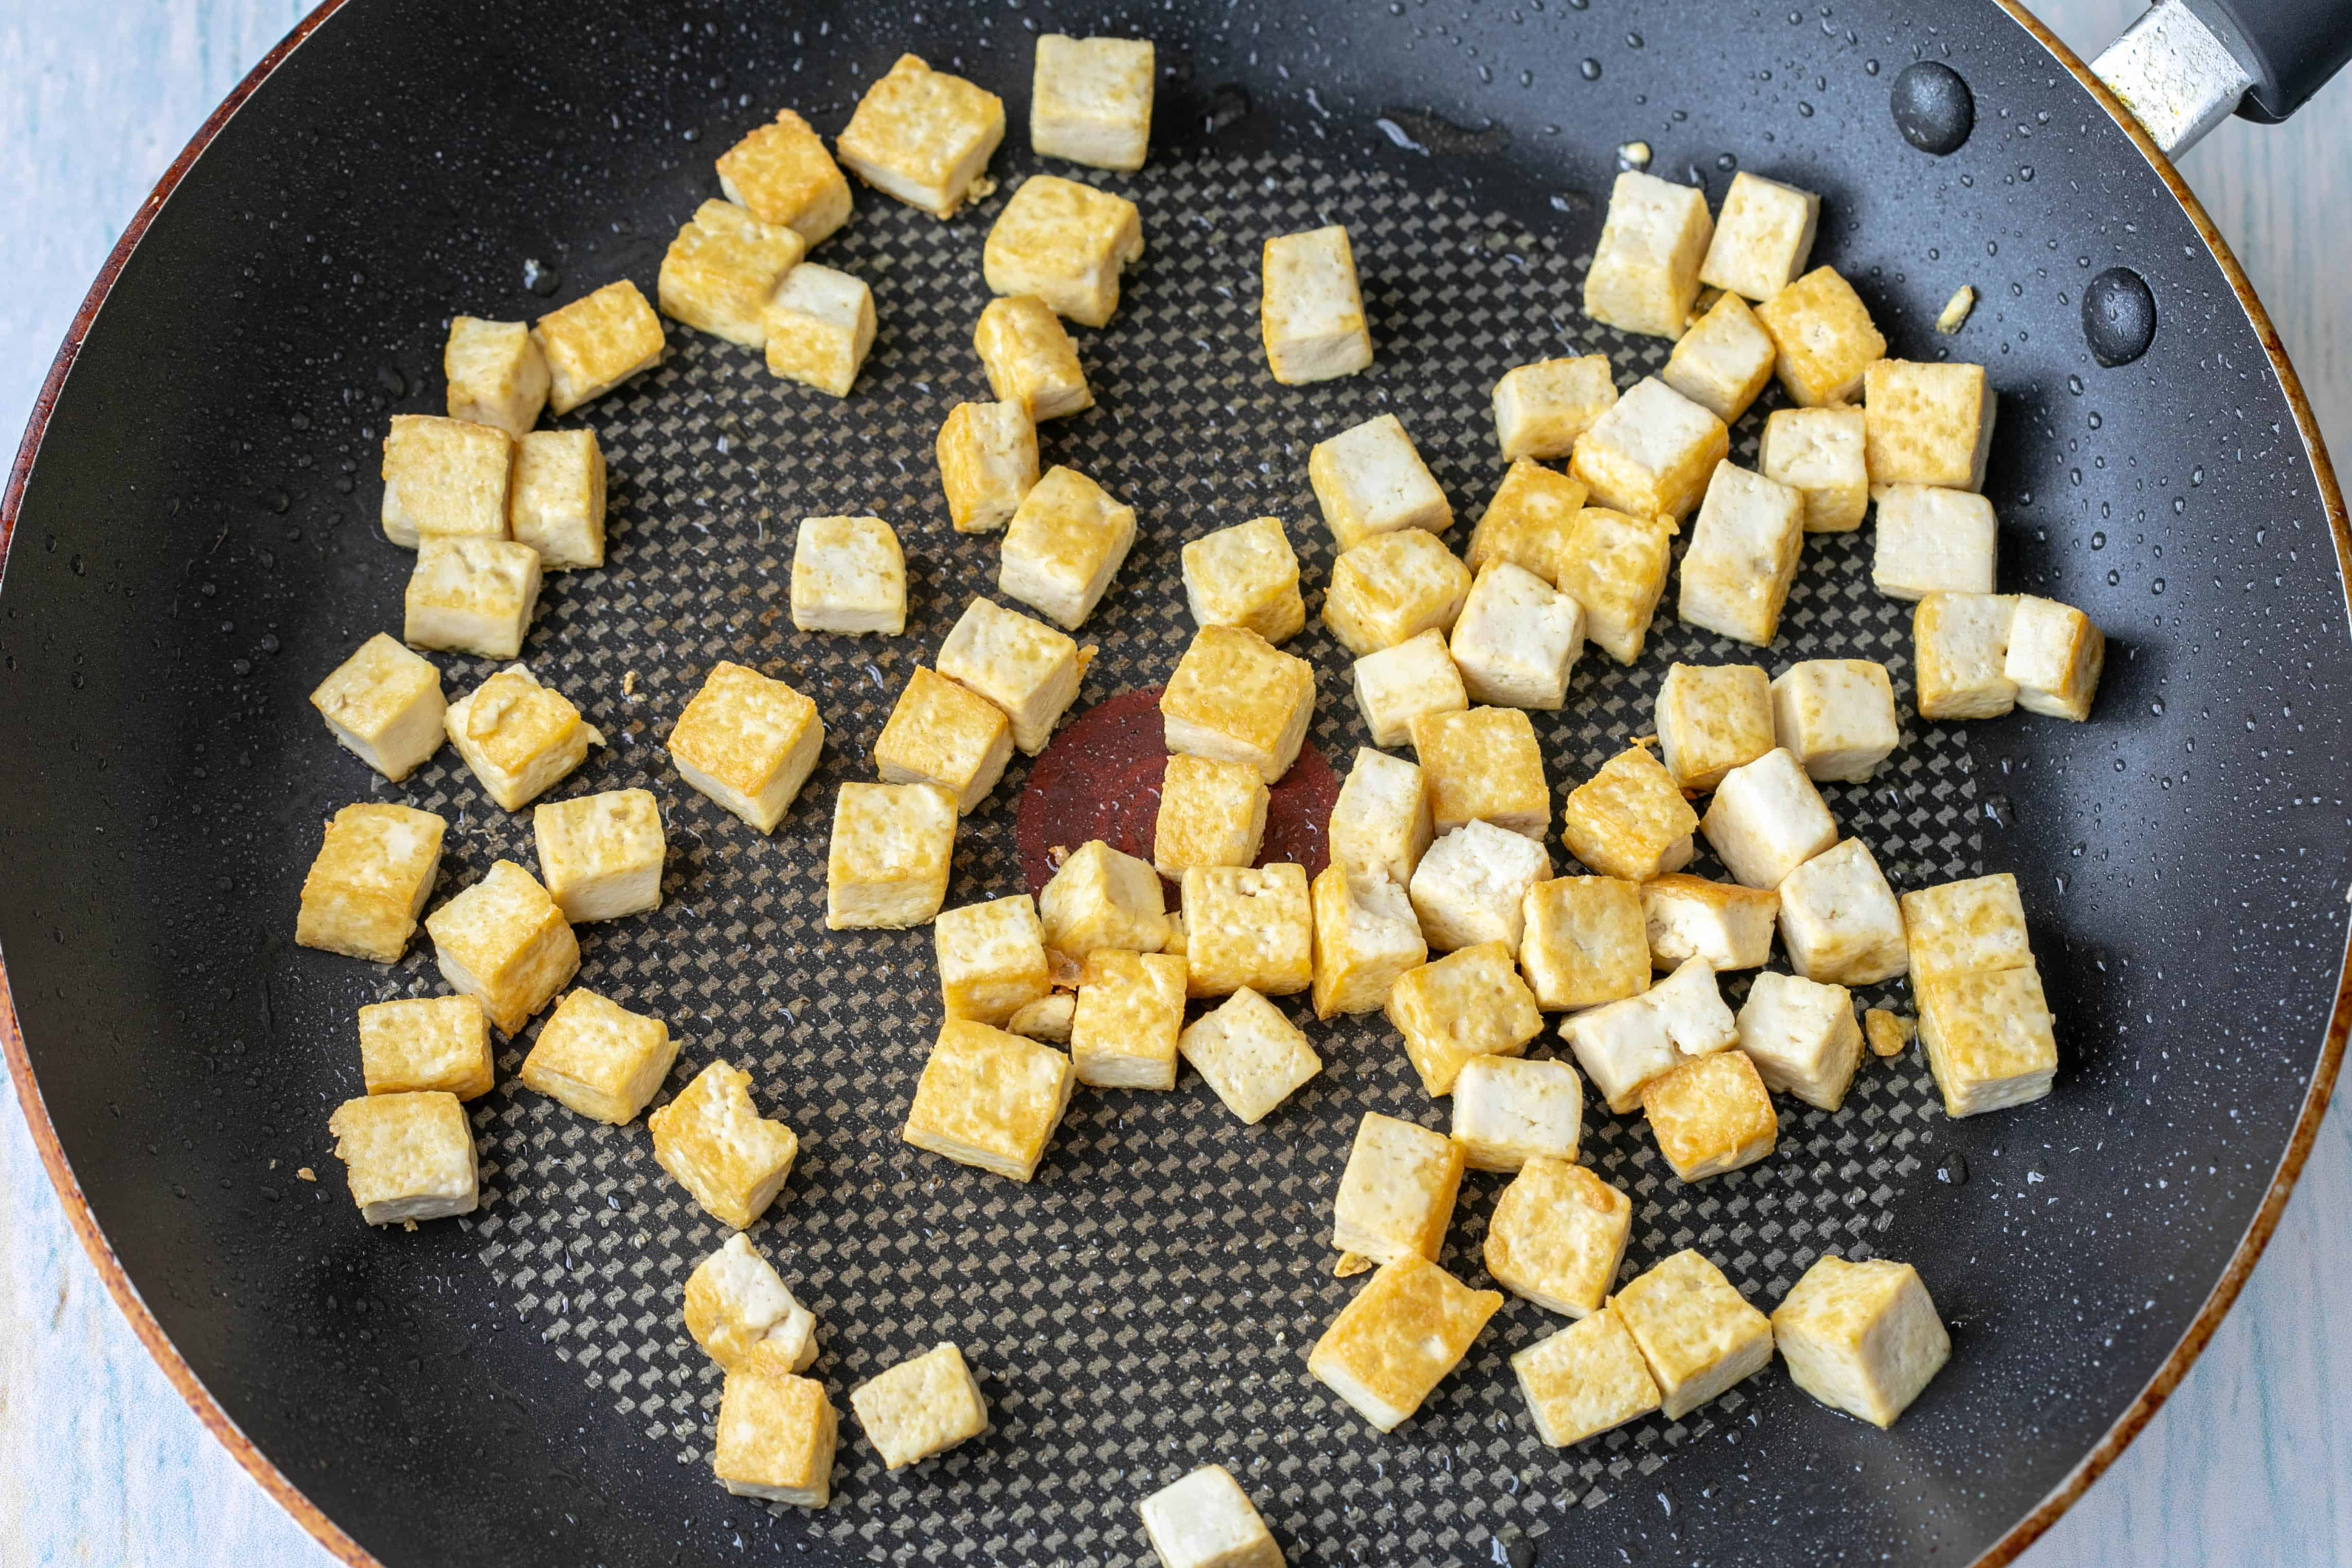 tofu cubes browning in nonstick pan